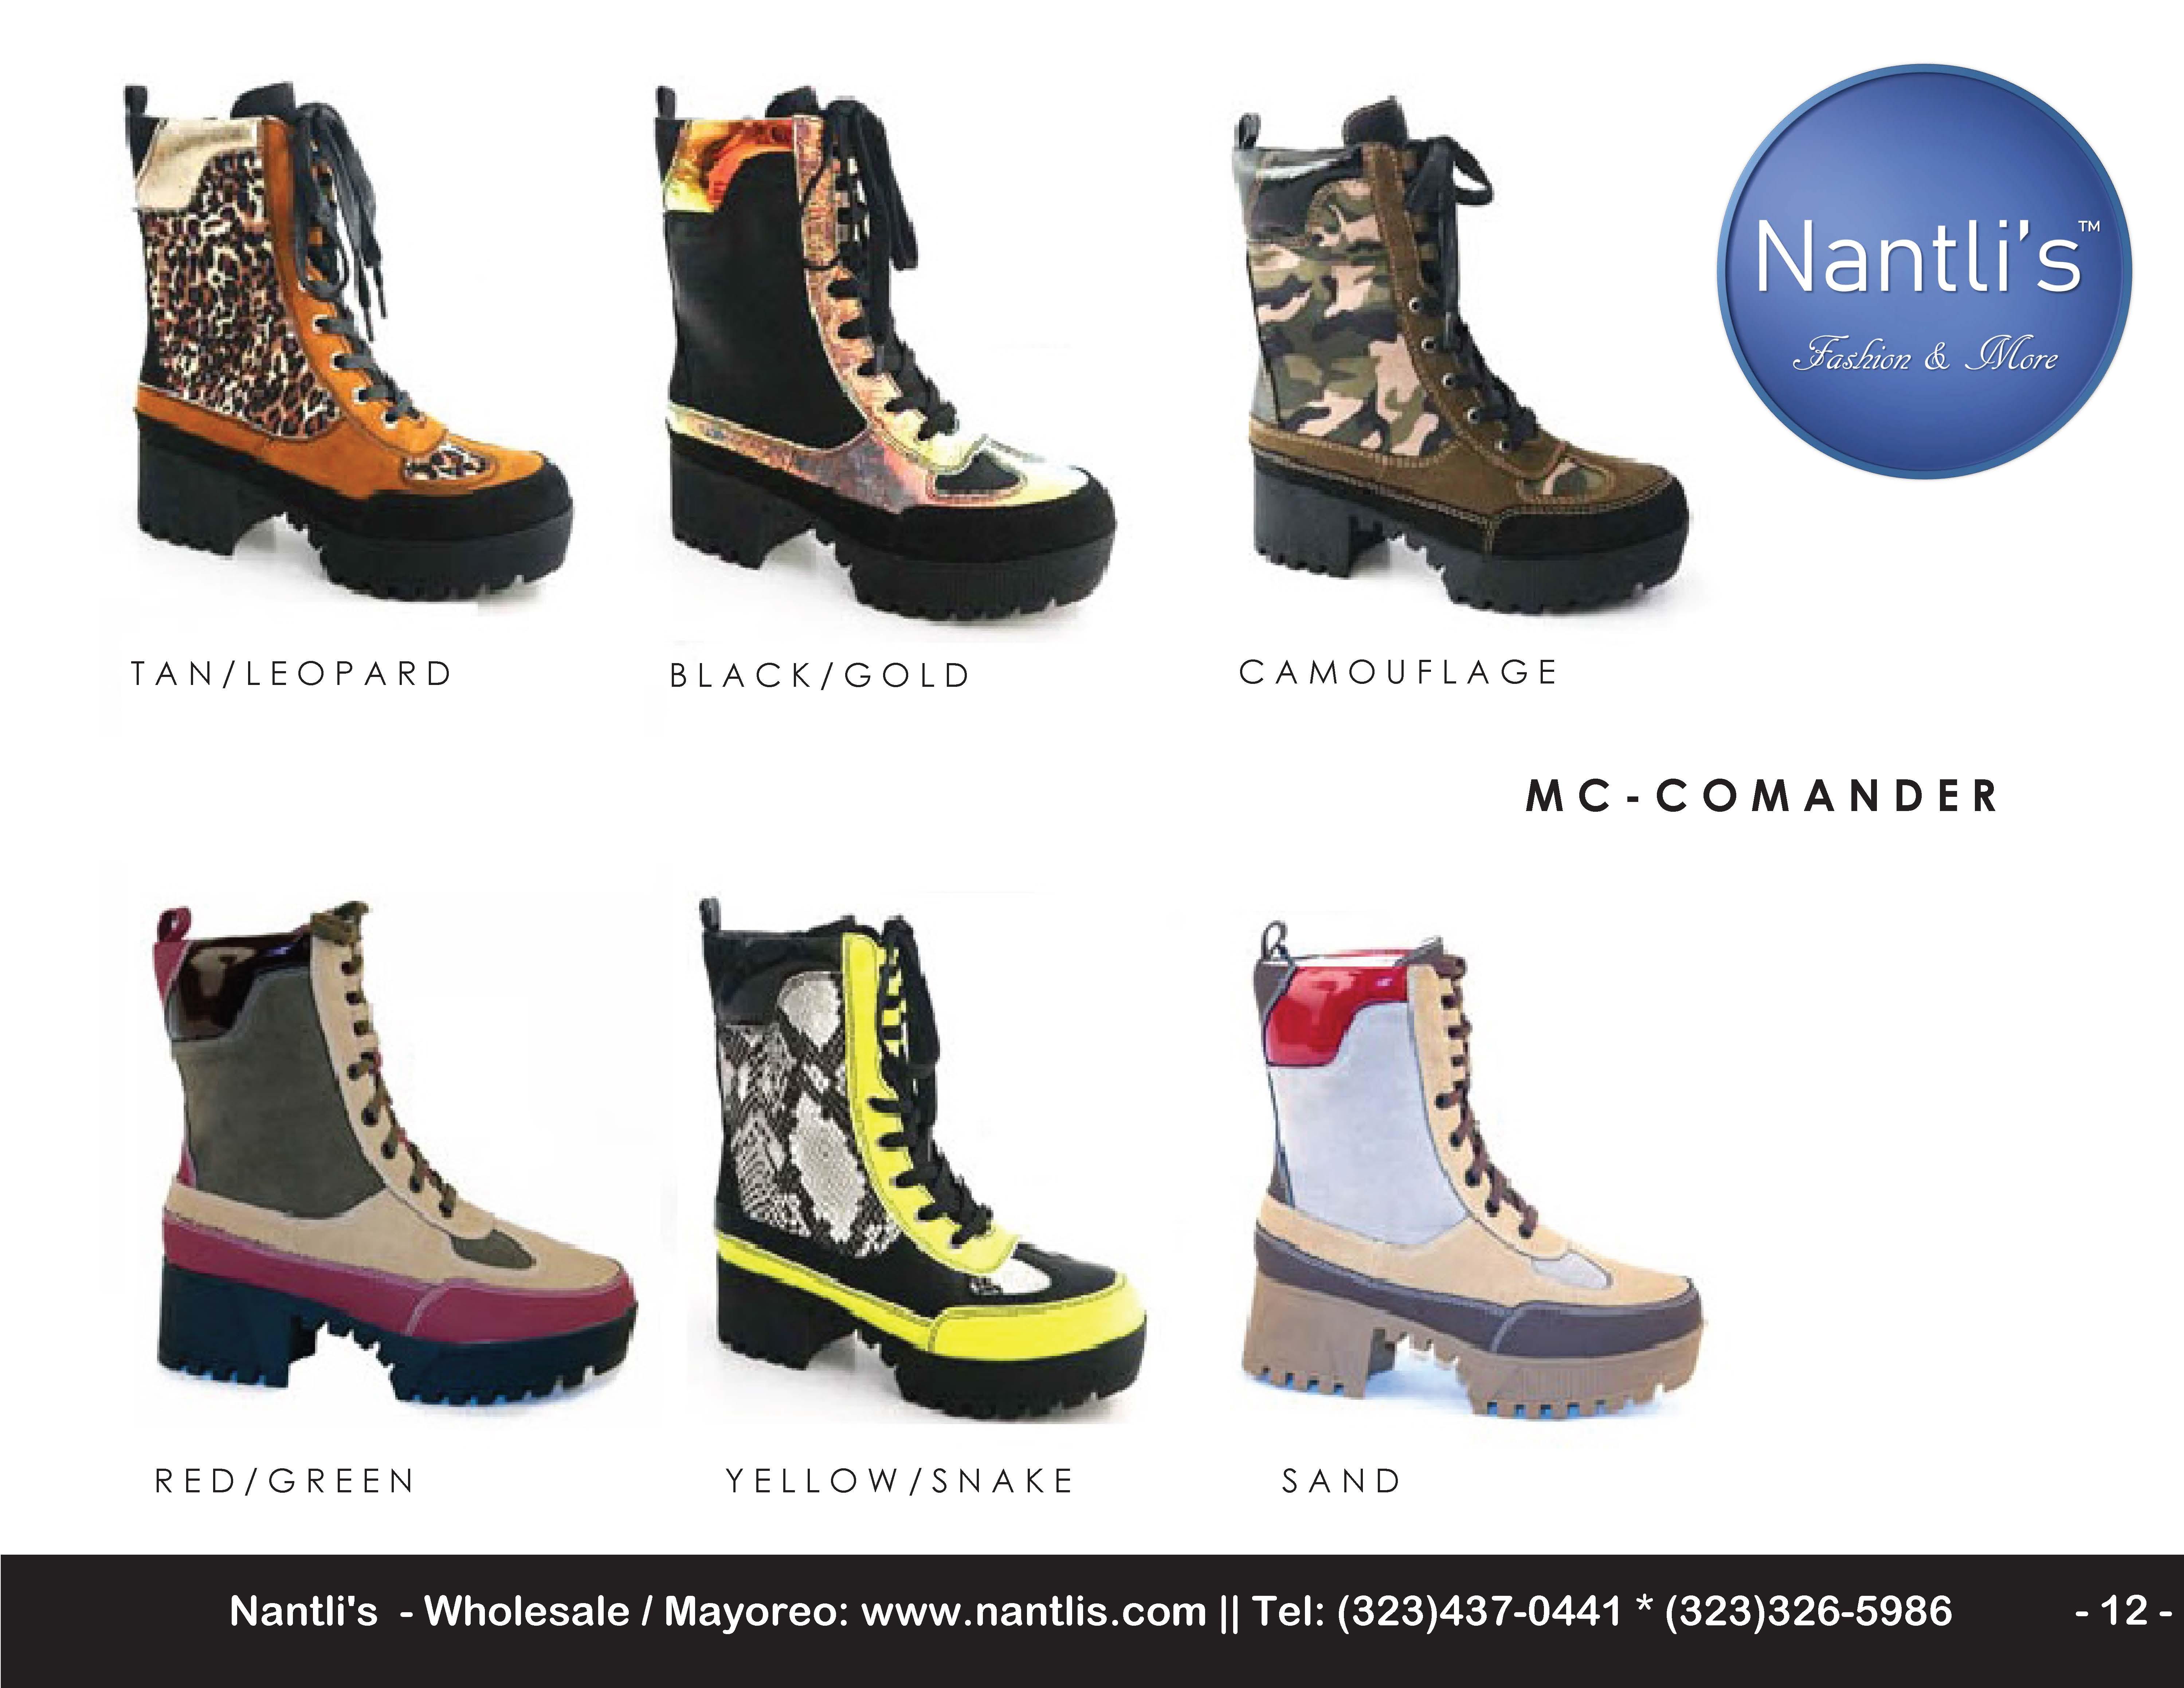 Nantlis Vol BL39 Botas de Mujer mayoreo Catalogo Wholesale womens Boots_Page_12